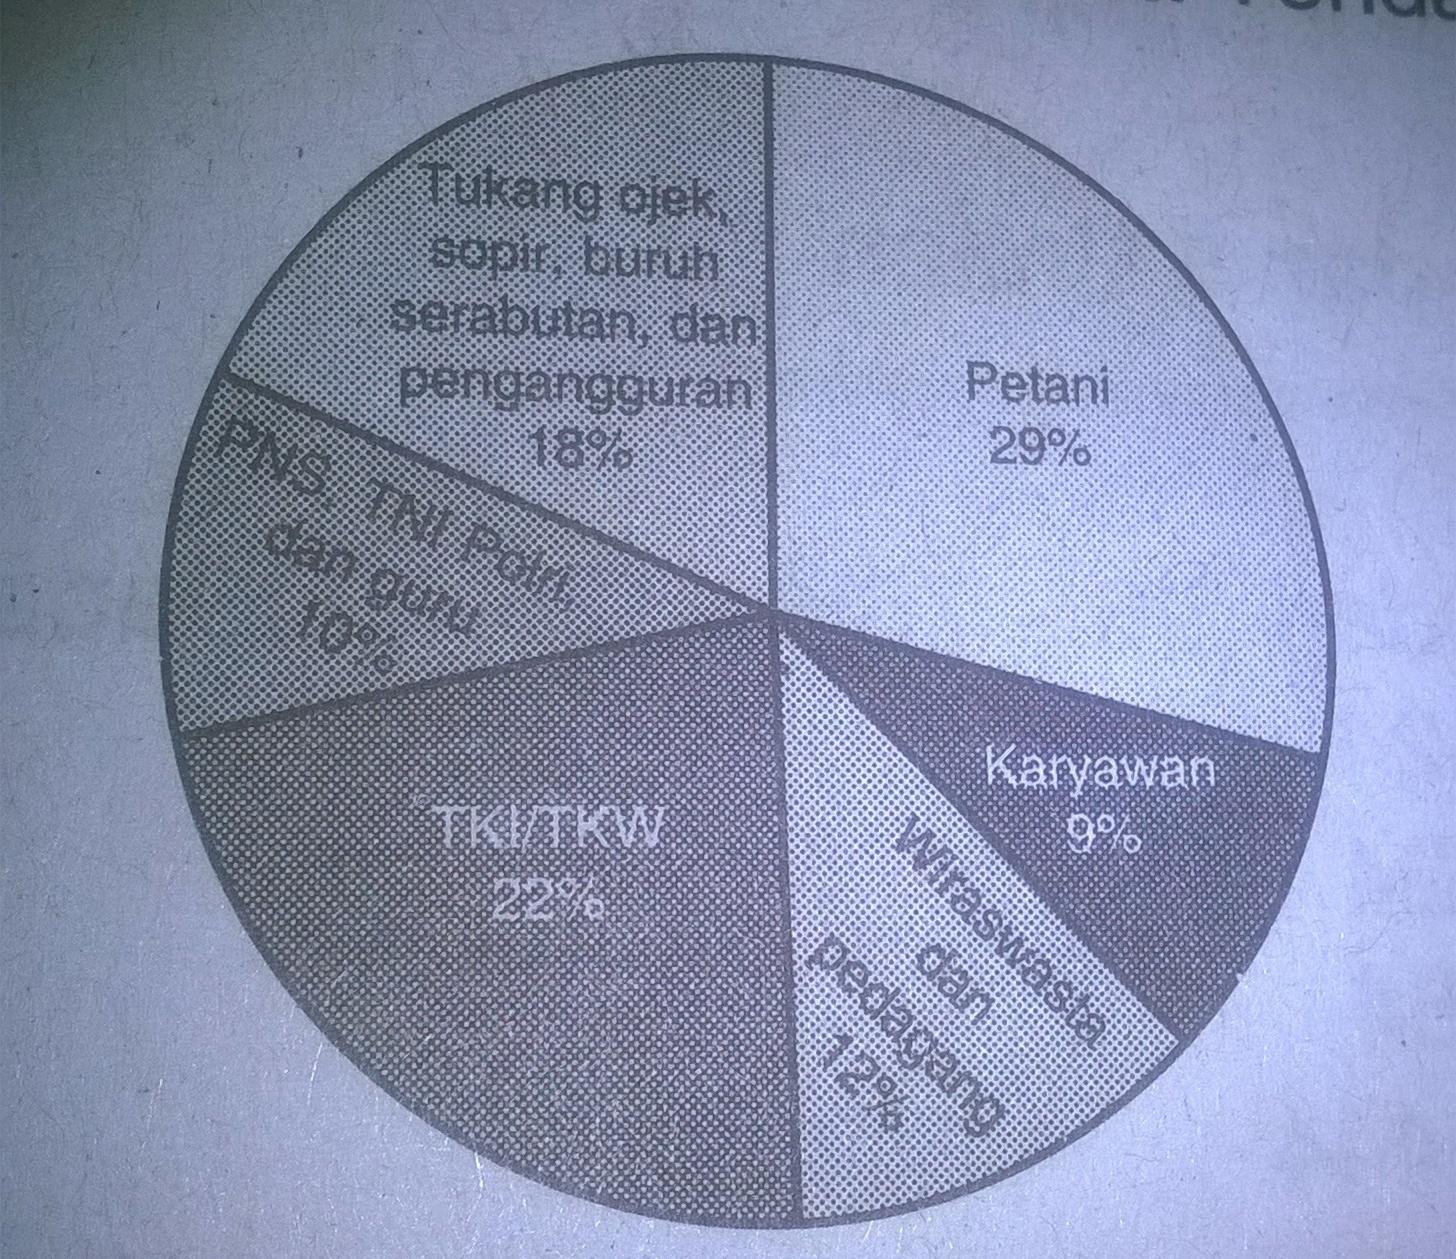 Perhatikan diagram lingkaran tentang mata pencaharian penduduk di unduh jpg ccuart Gallery